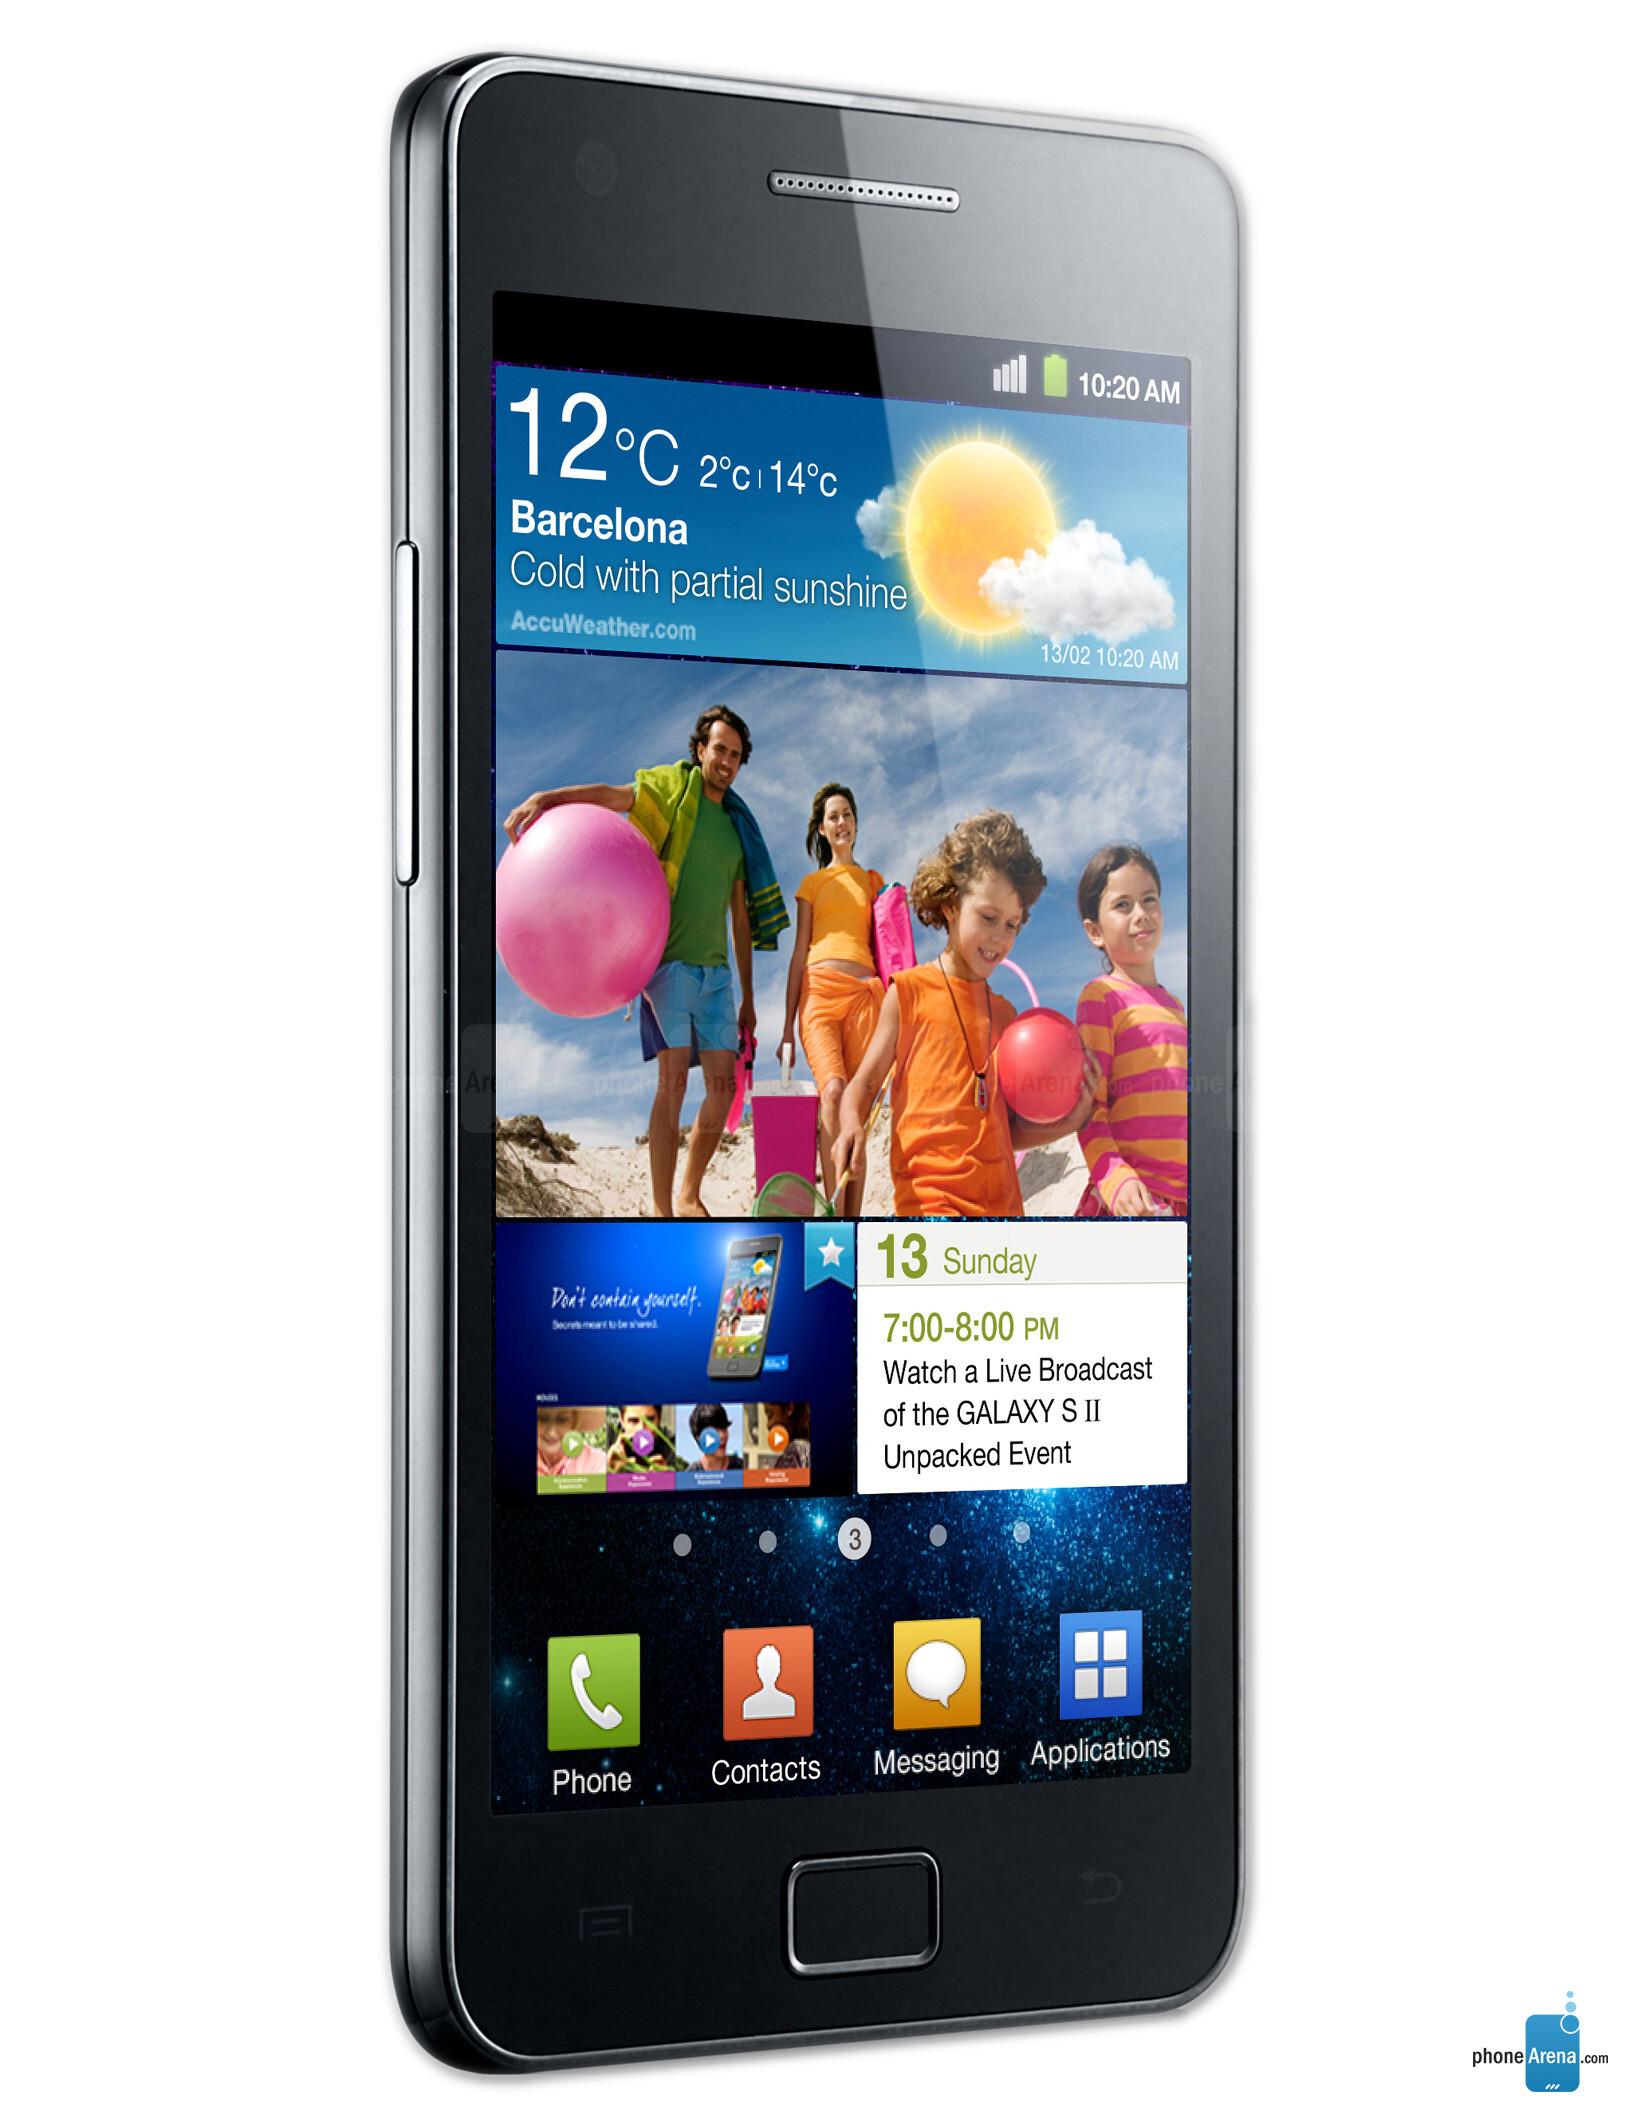 Samsung Galaxy S Ii Specs Advan S5j 4gb 8mp Featured In Best All One